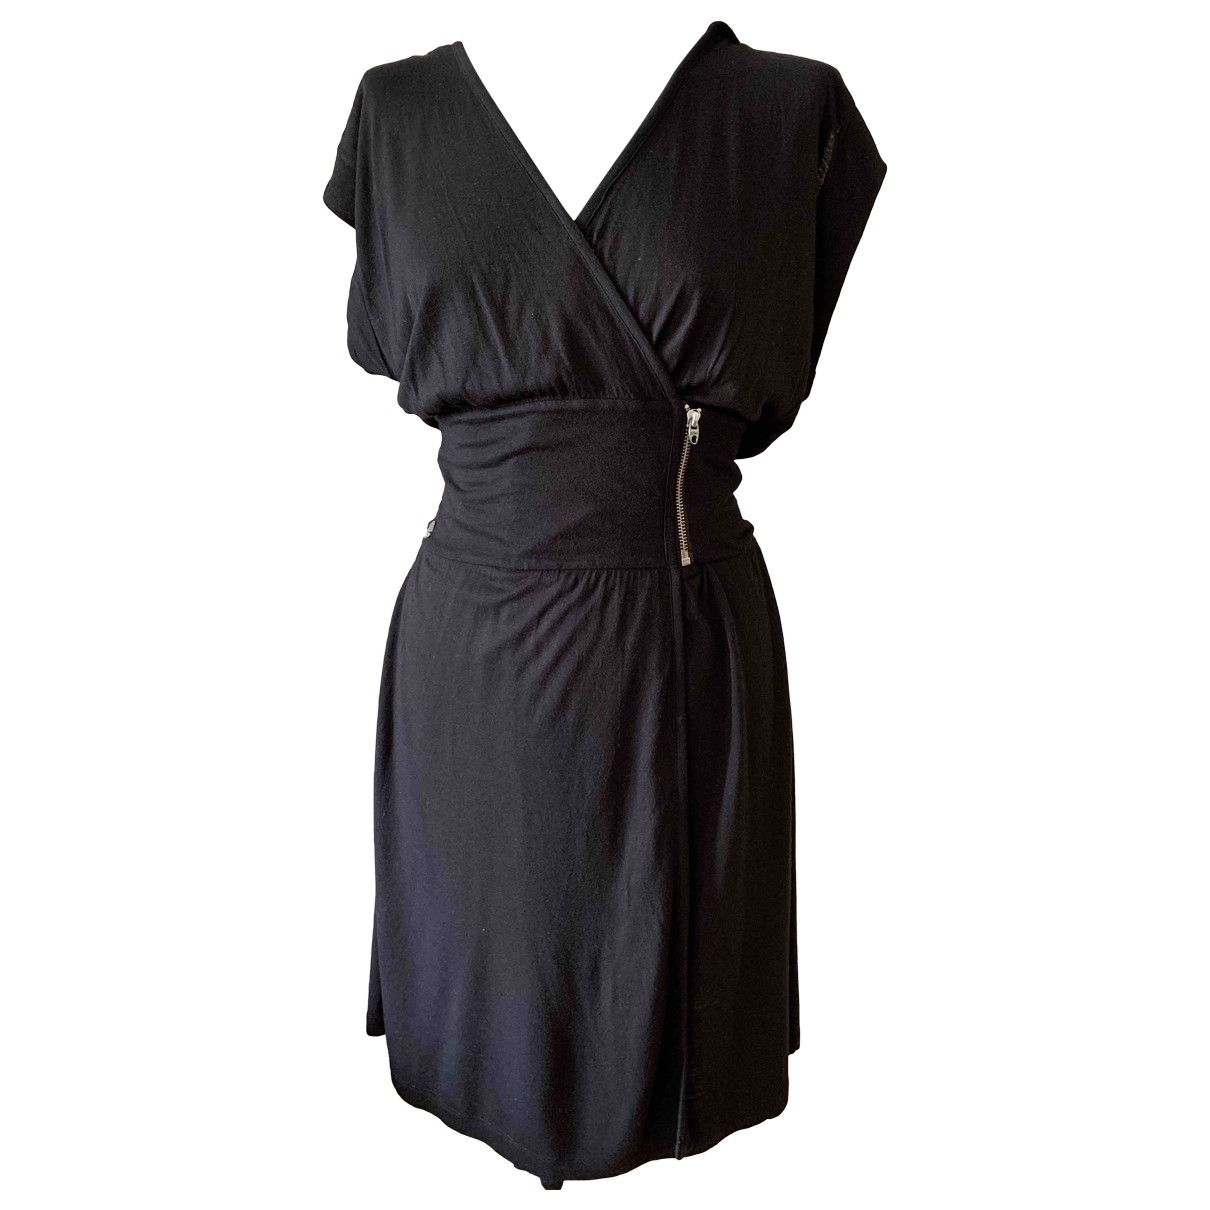 Diesel \N Black Wool dress for Women S International